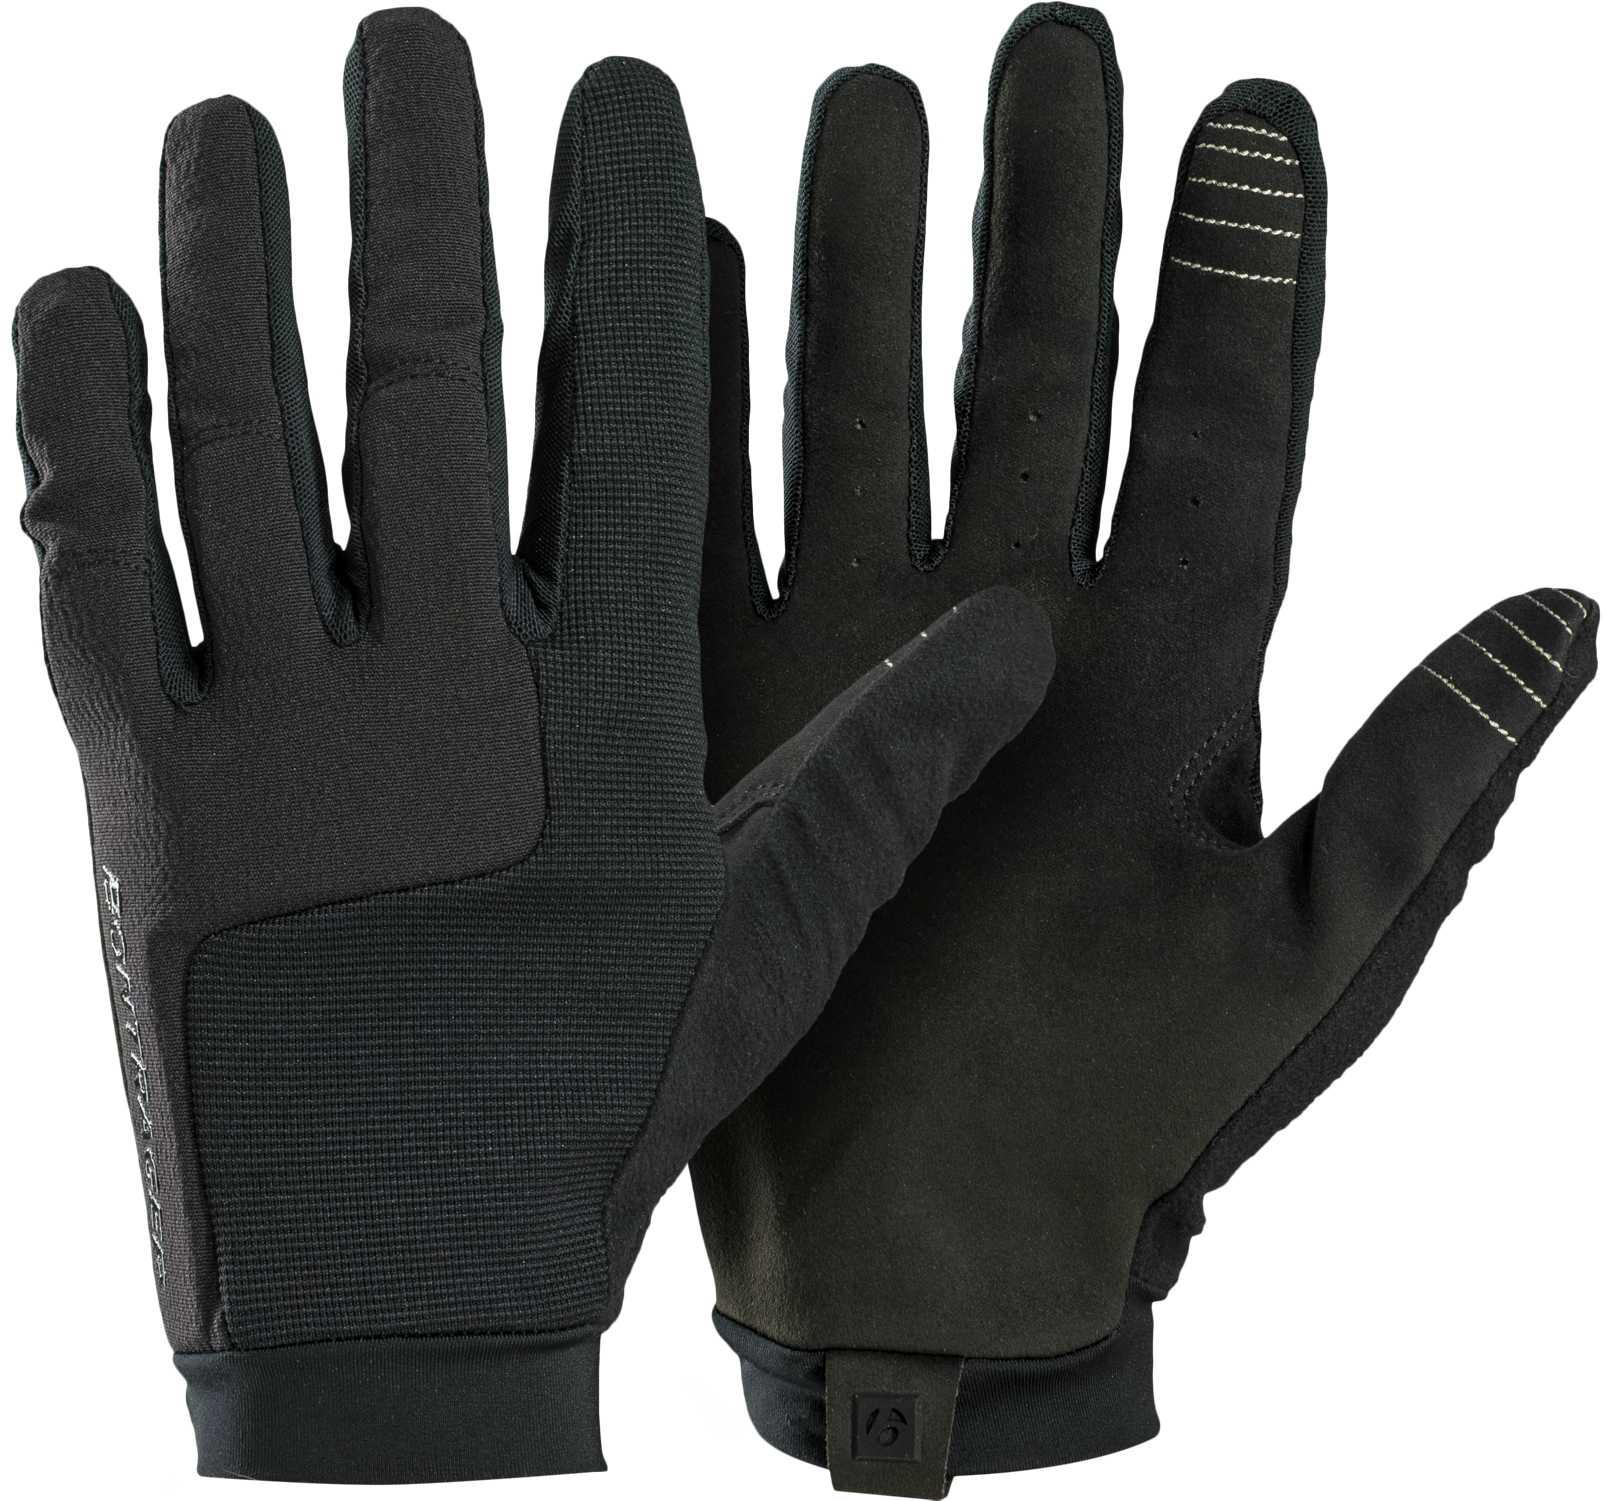 Handskar Bontrager Rhythm dam svart | Gloves